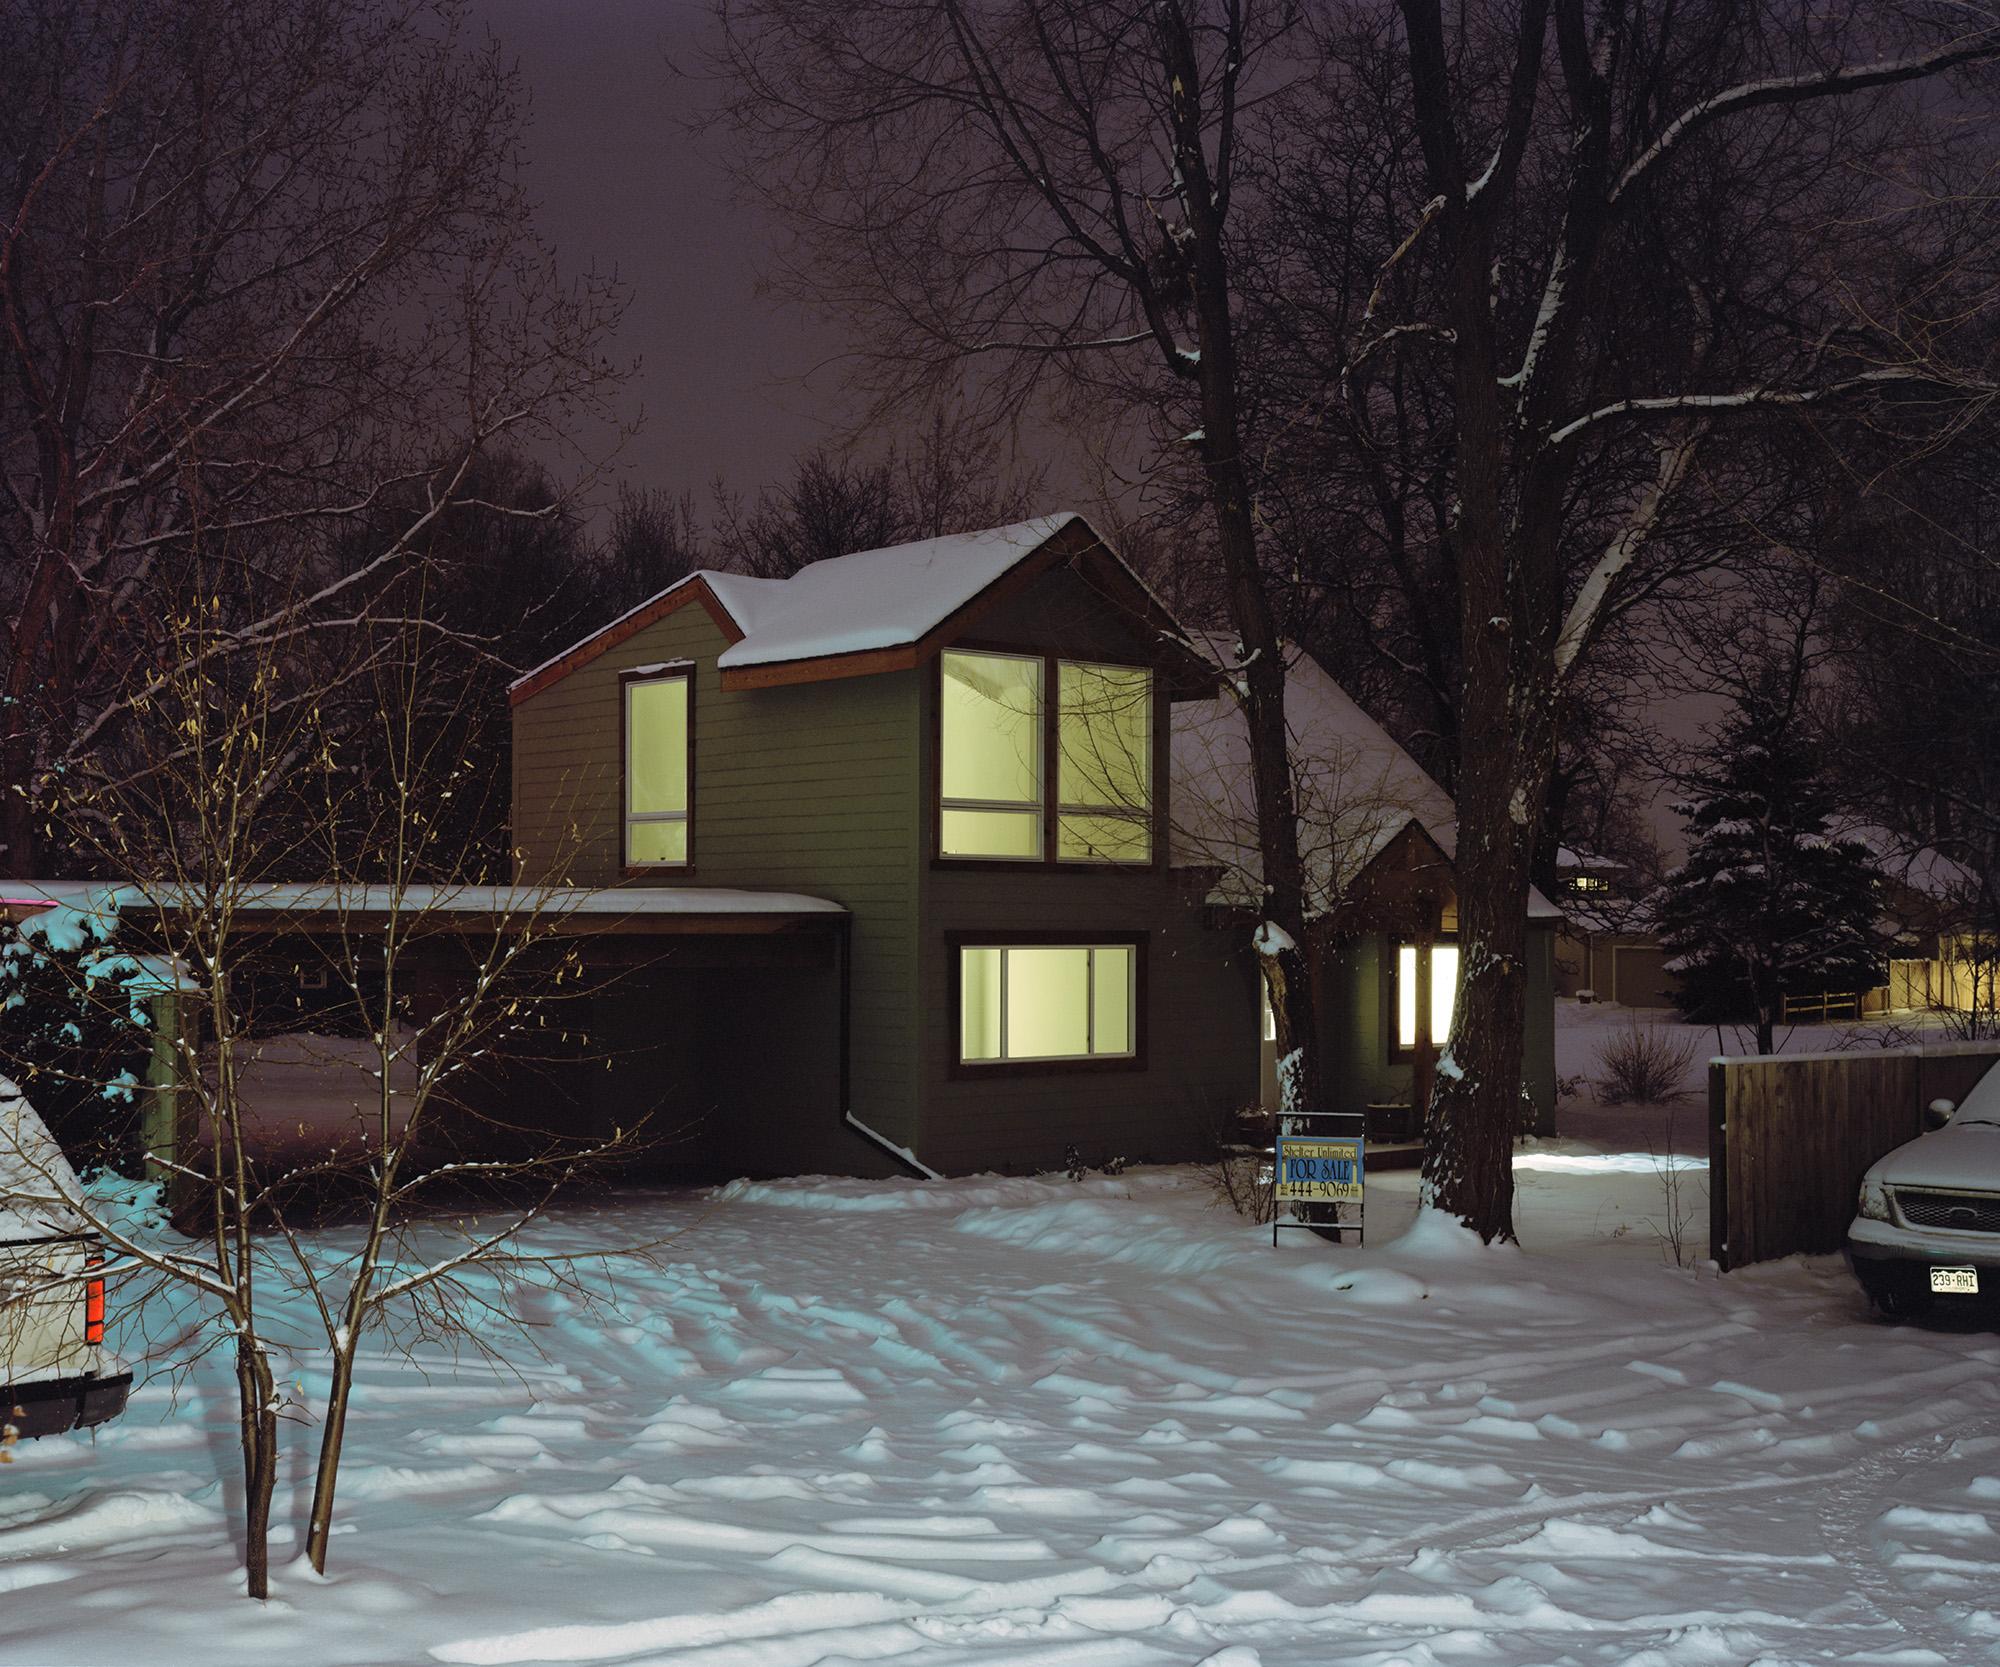 House at Night, Gun Barrel, CO.